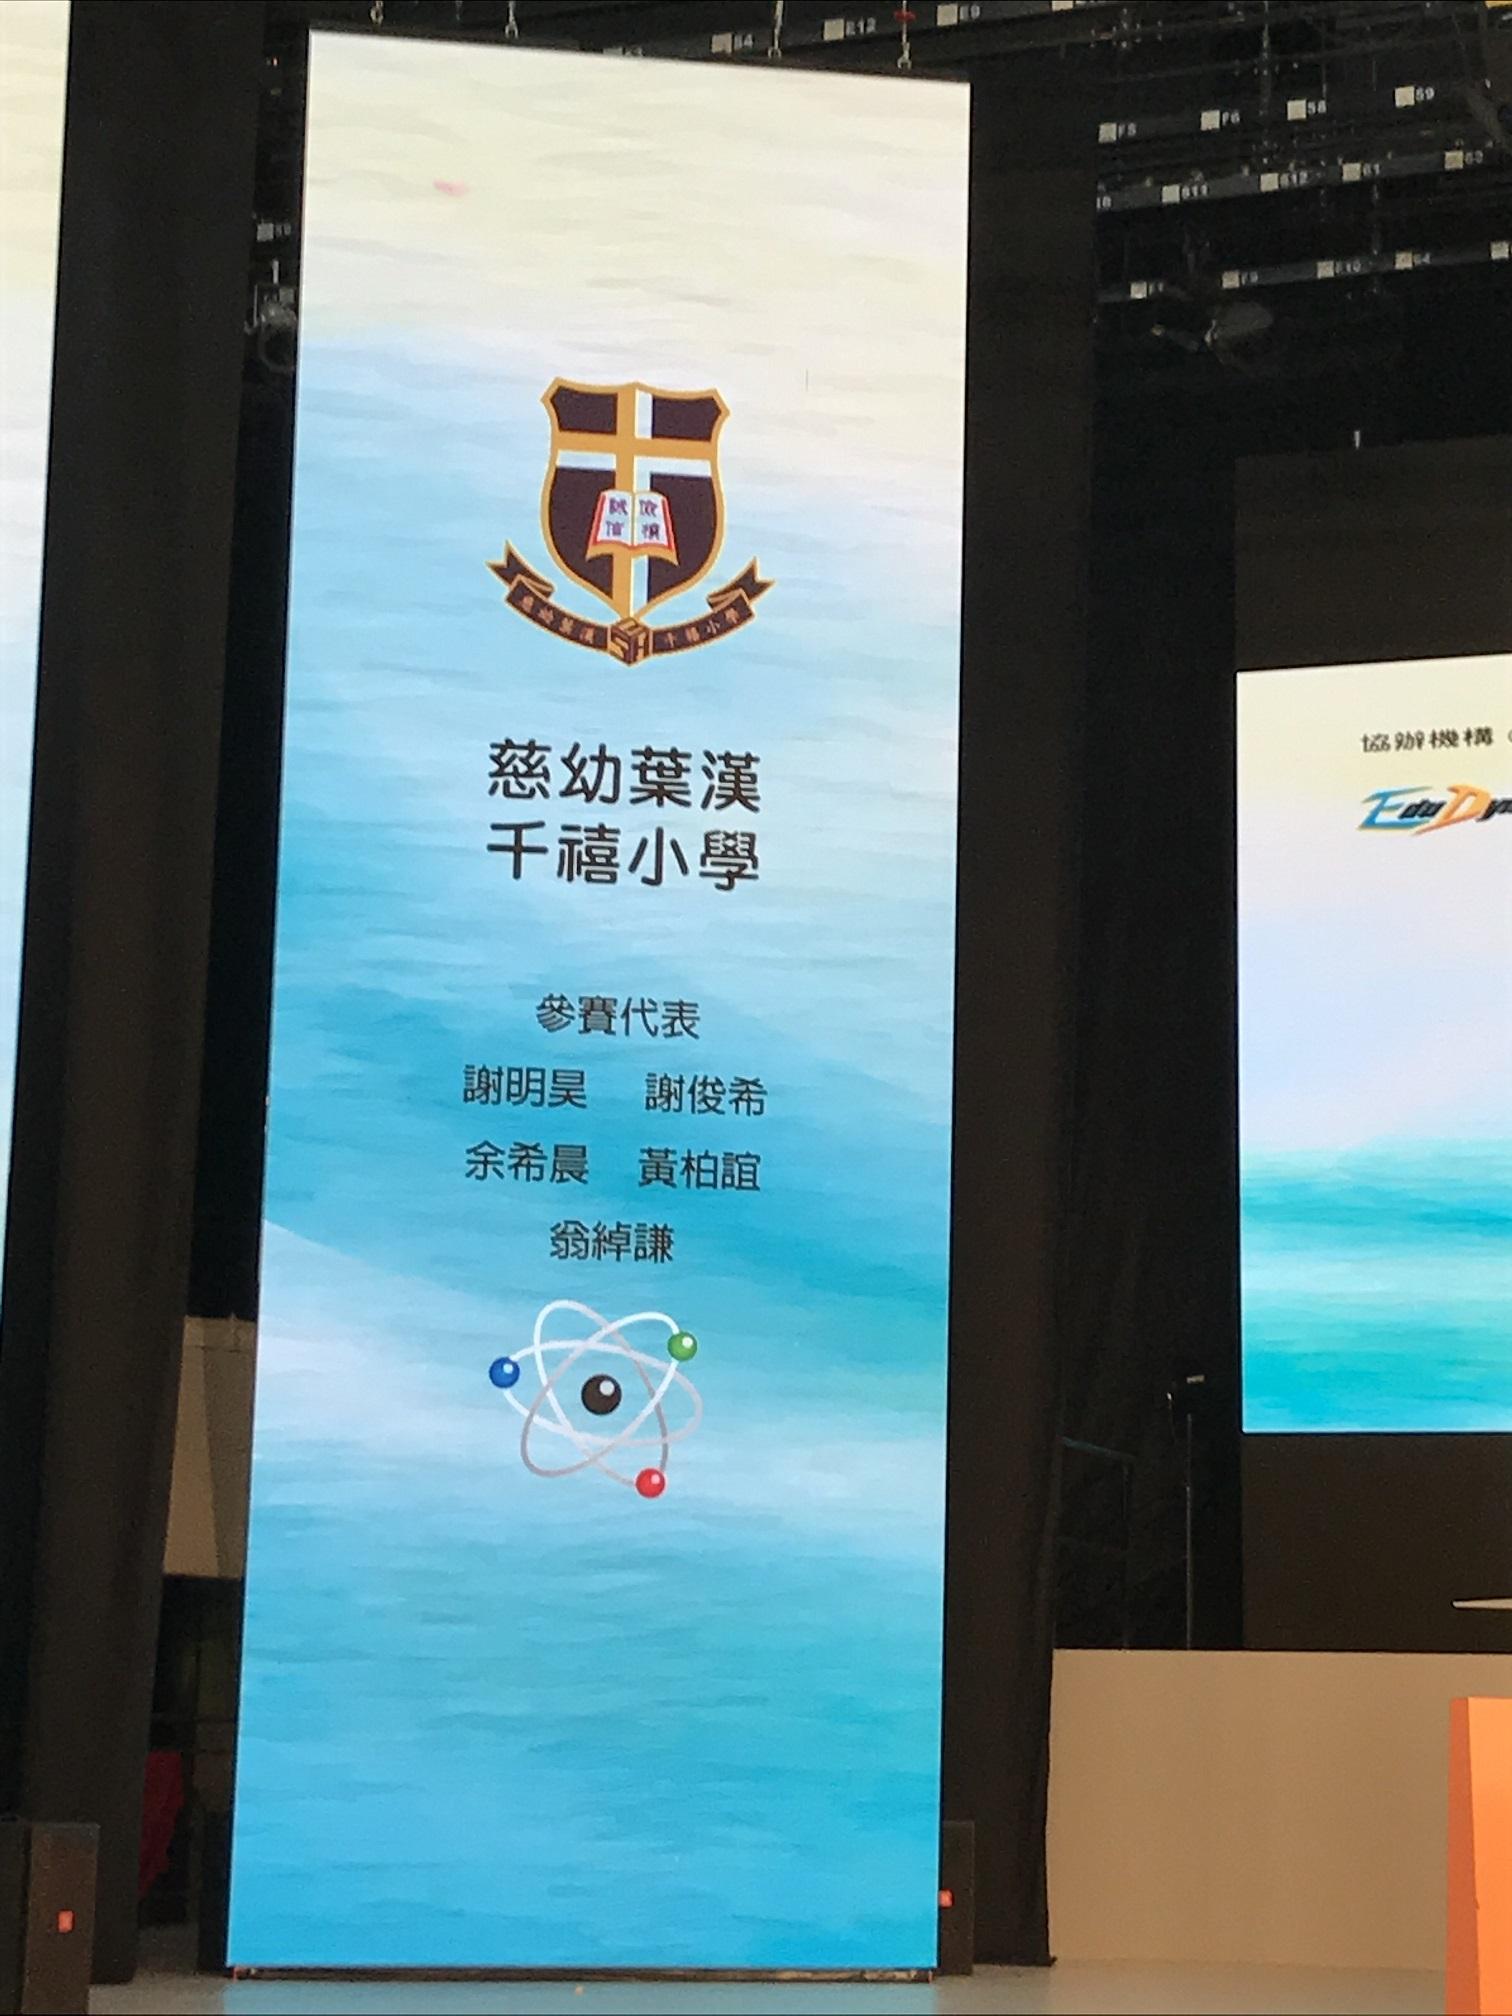 https://syh.edu.hk/sites/default/files/img-7577.jpg